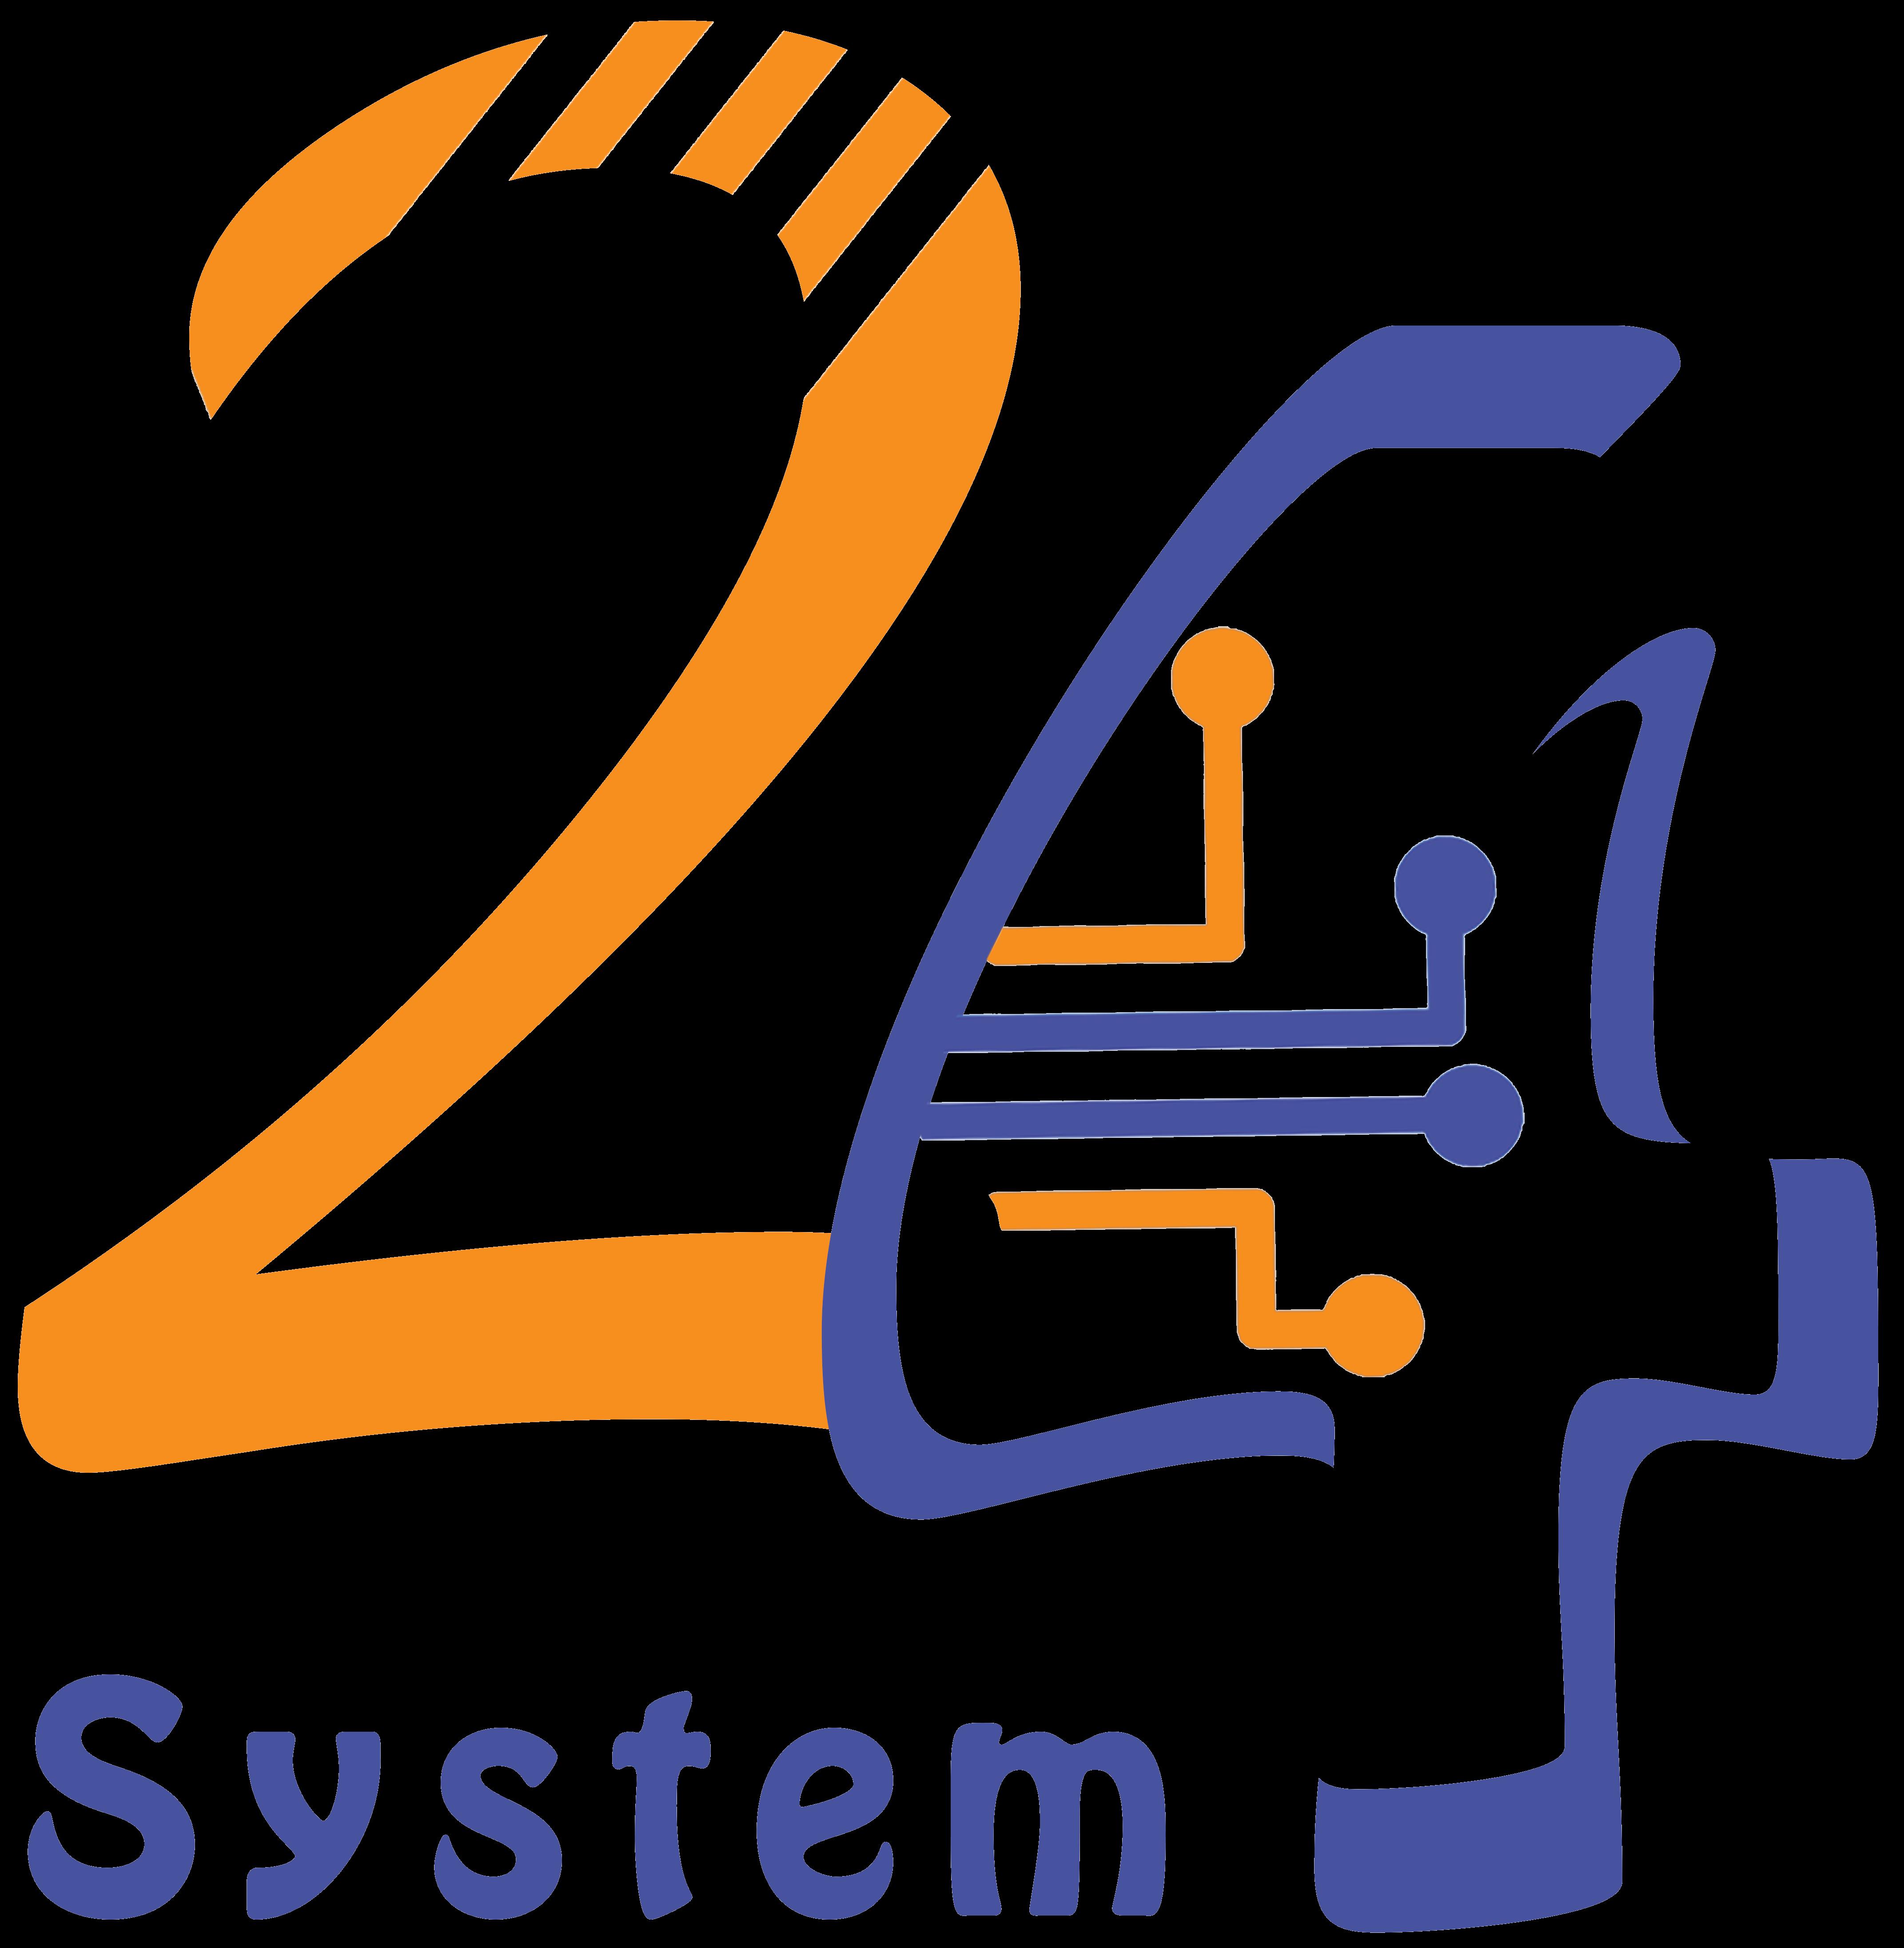 24System